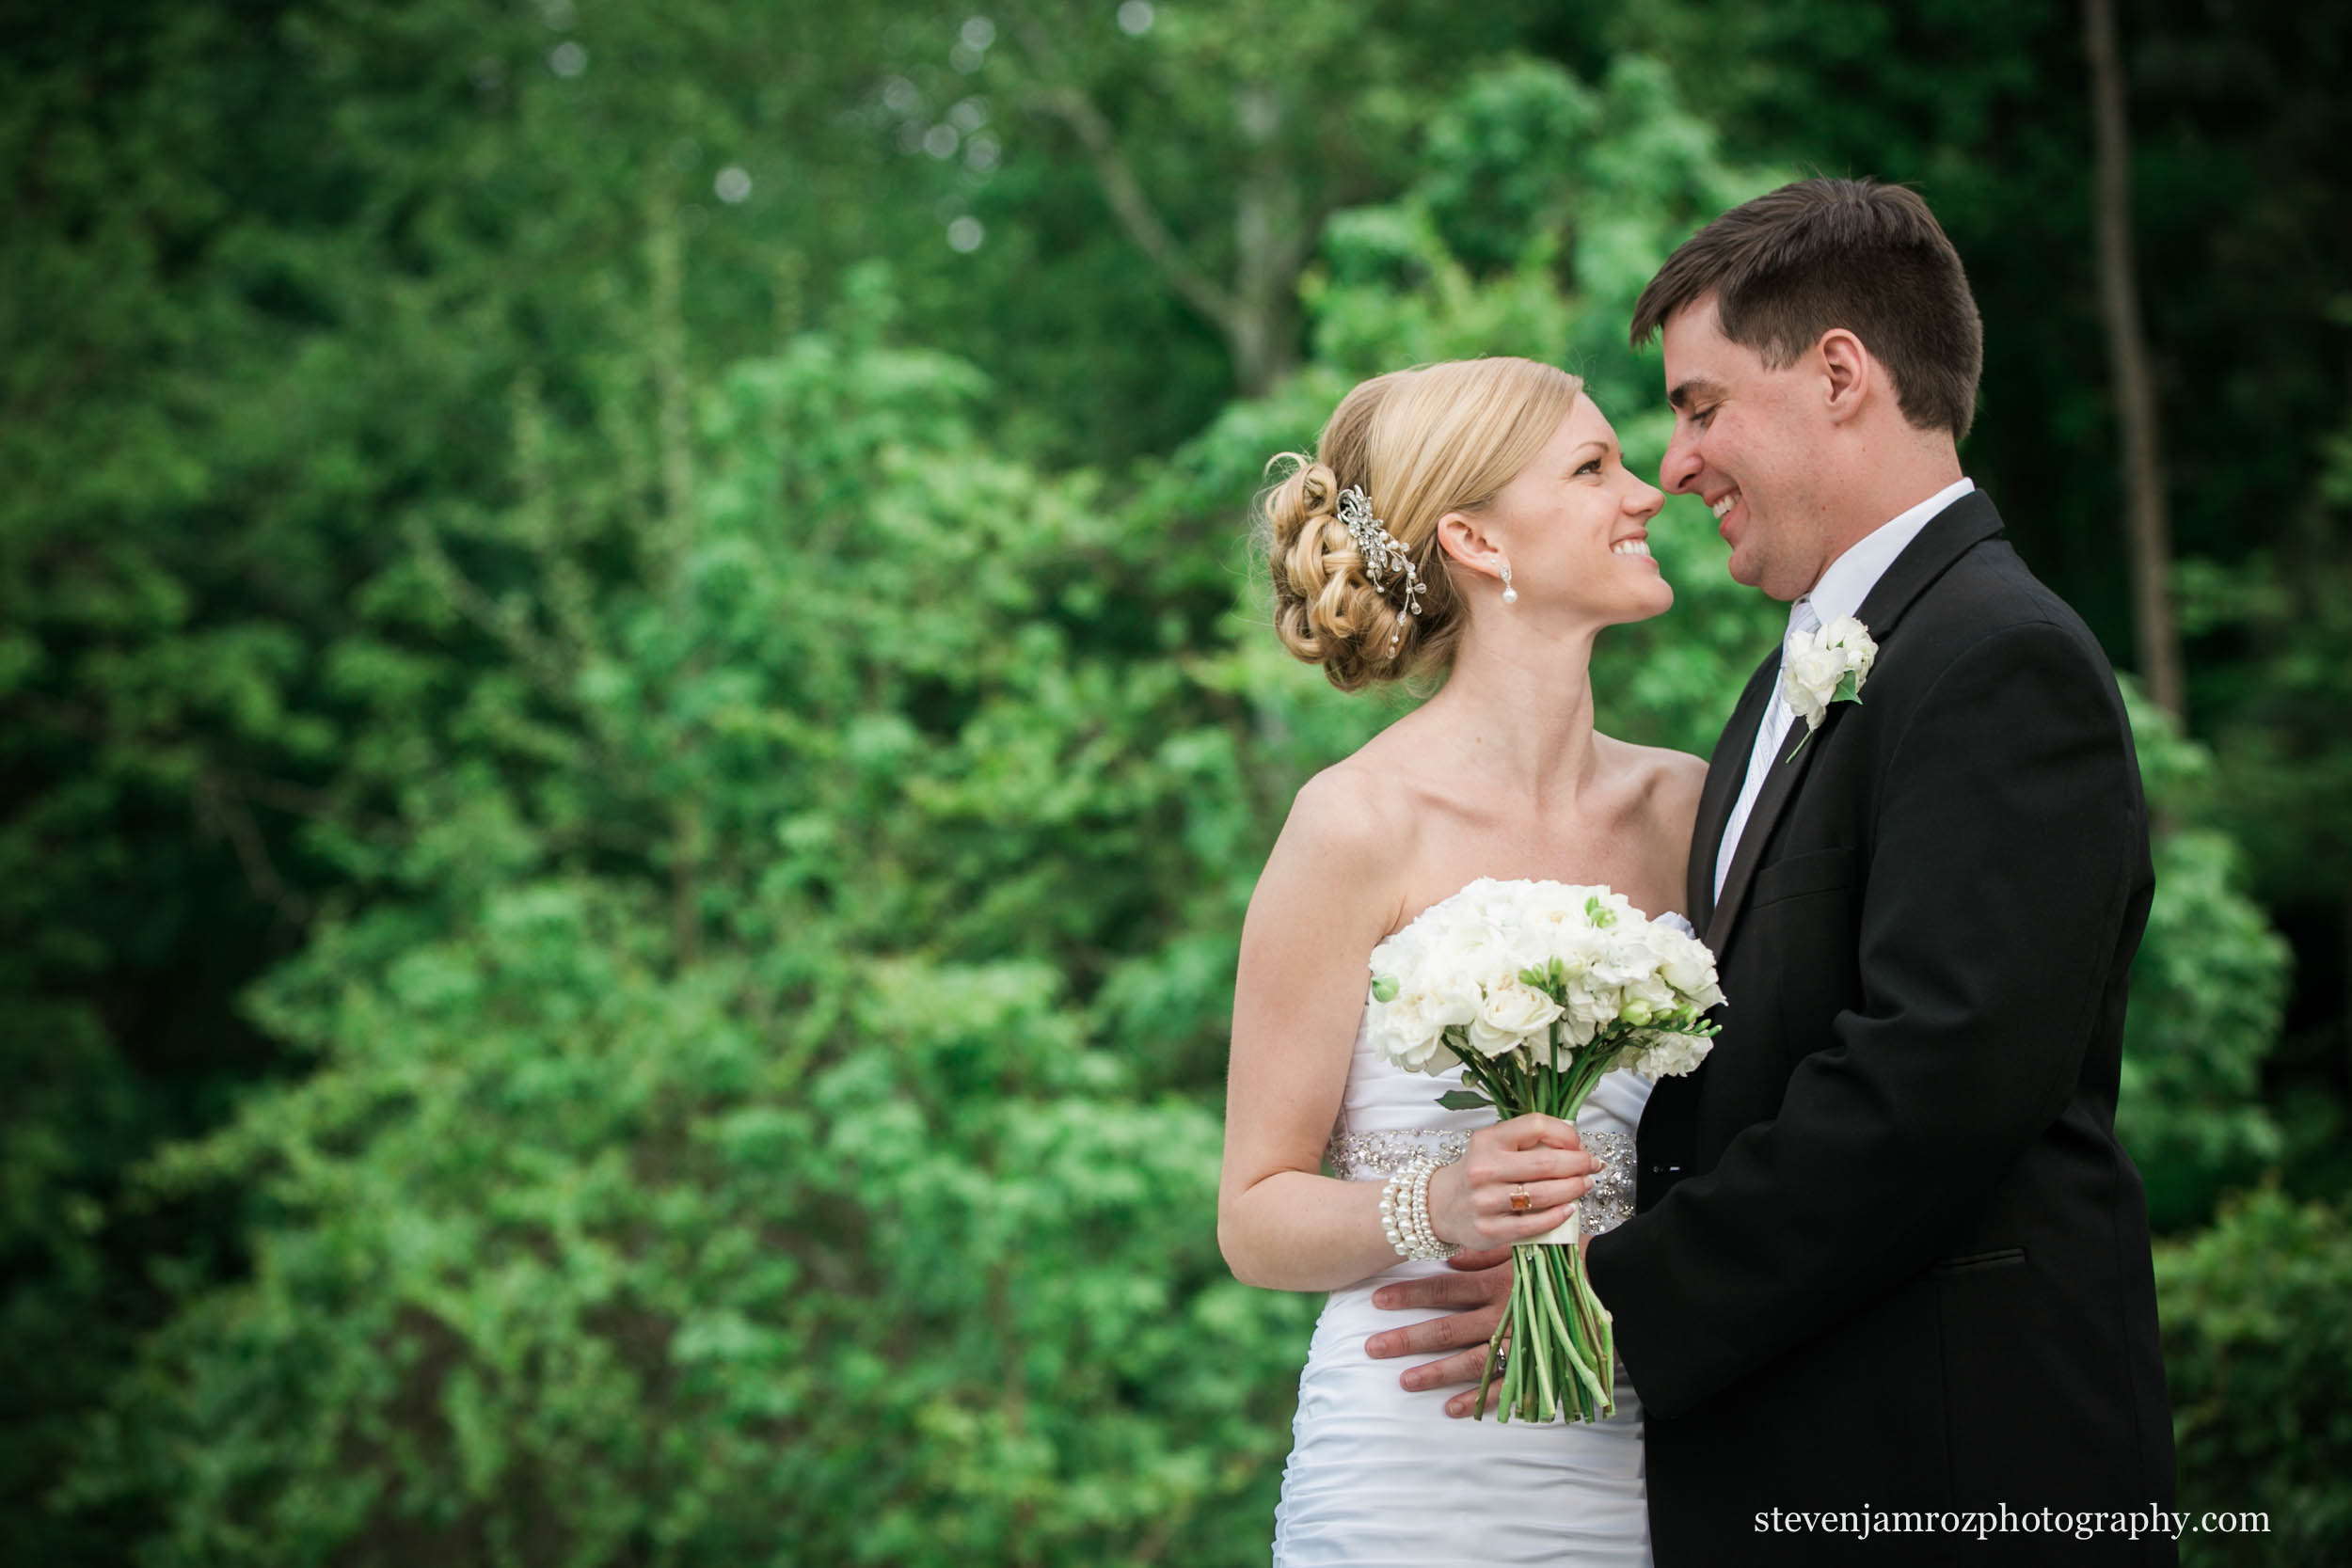 north-raleigh-wedding-couple-steven-jamroz-photography-0367.jpg